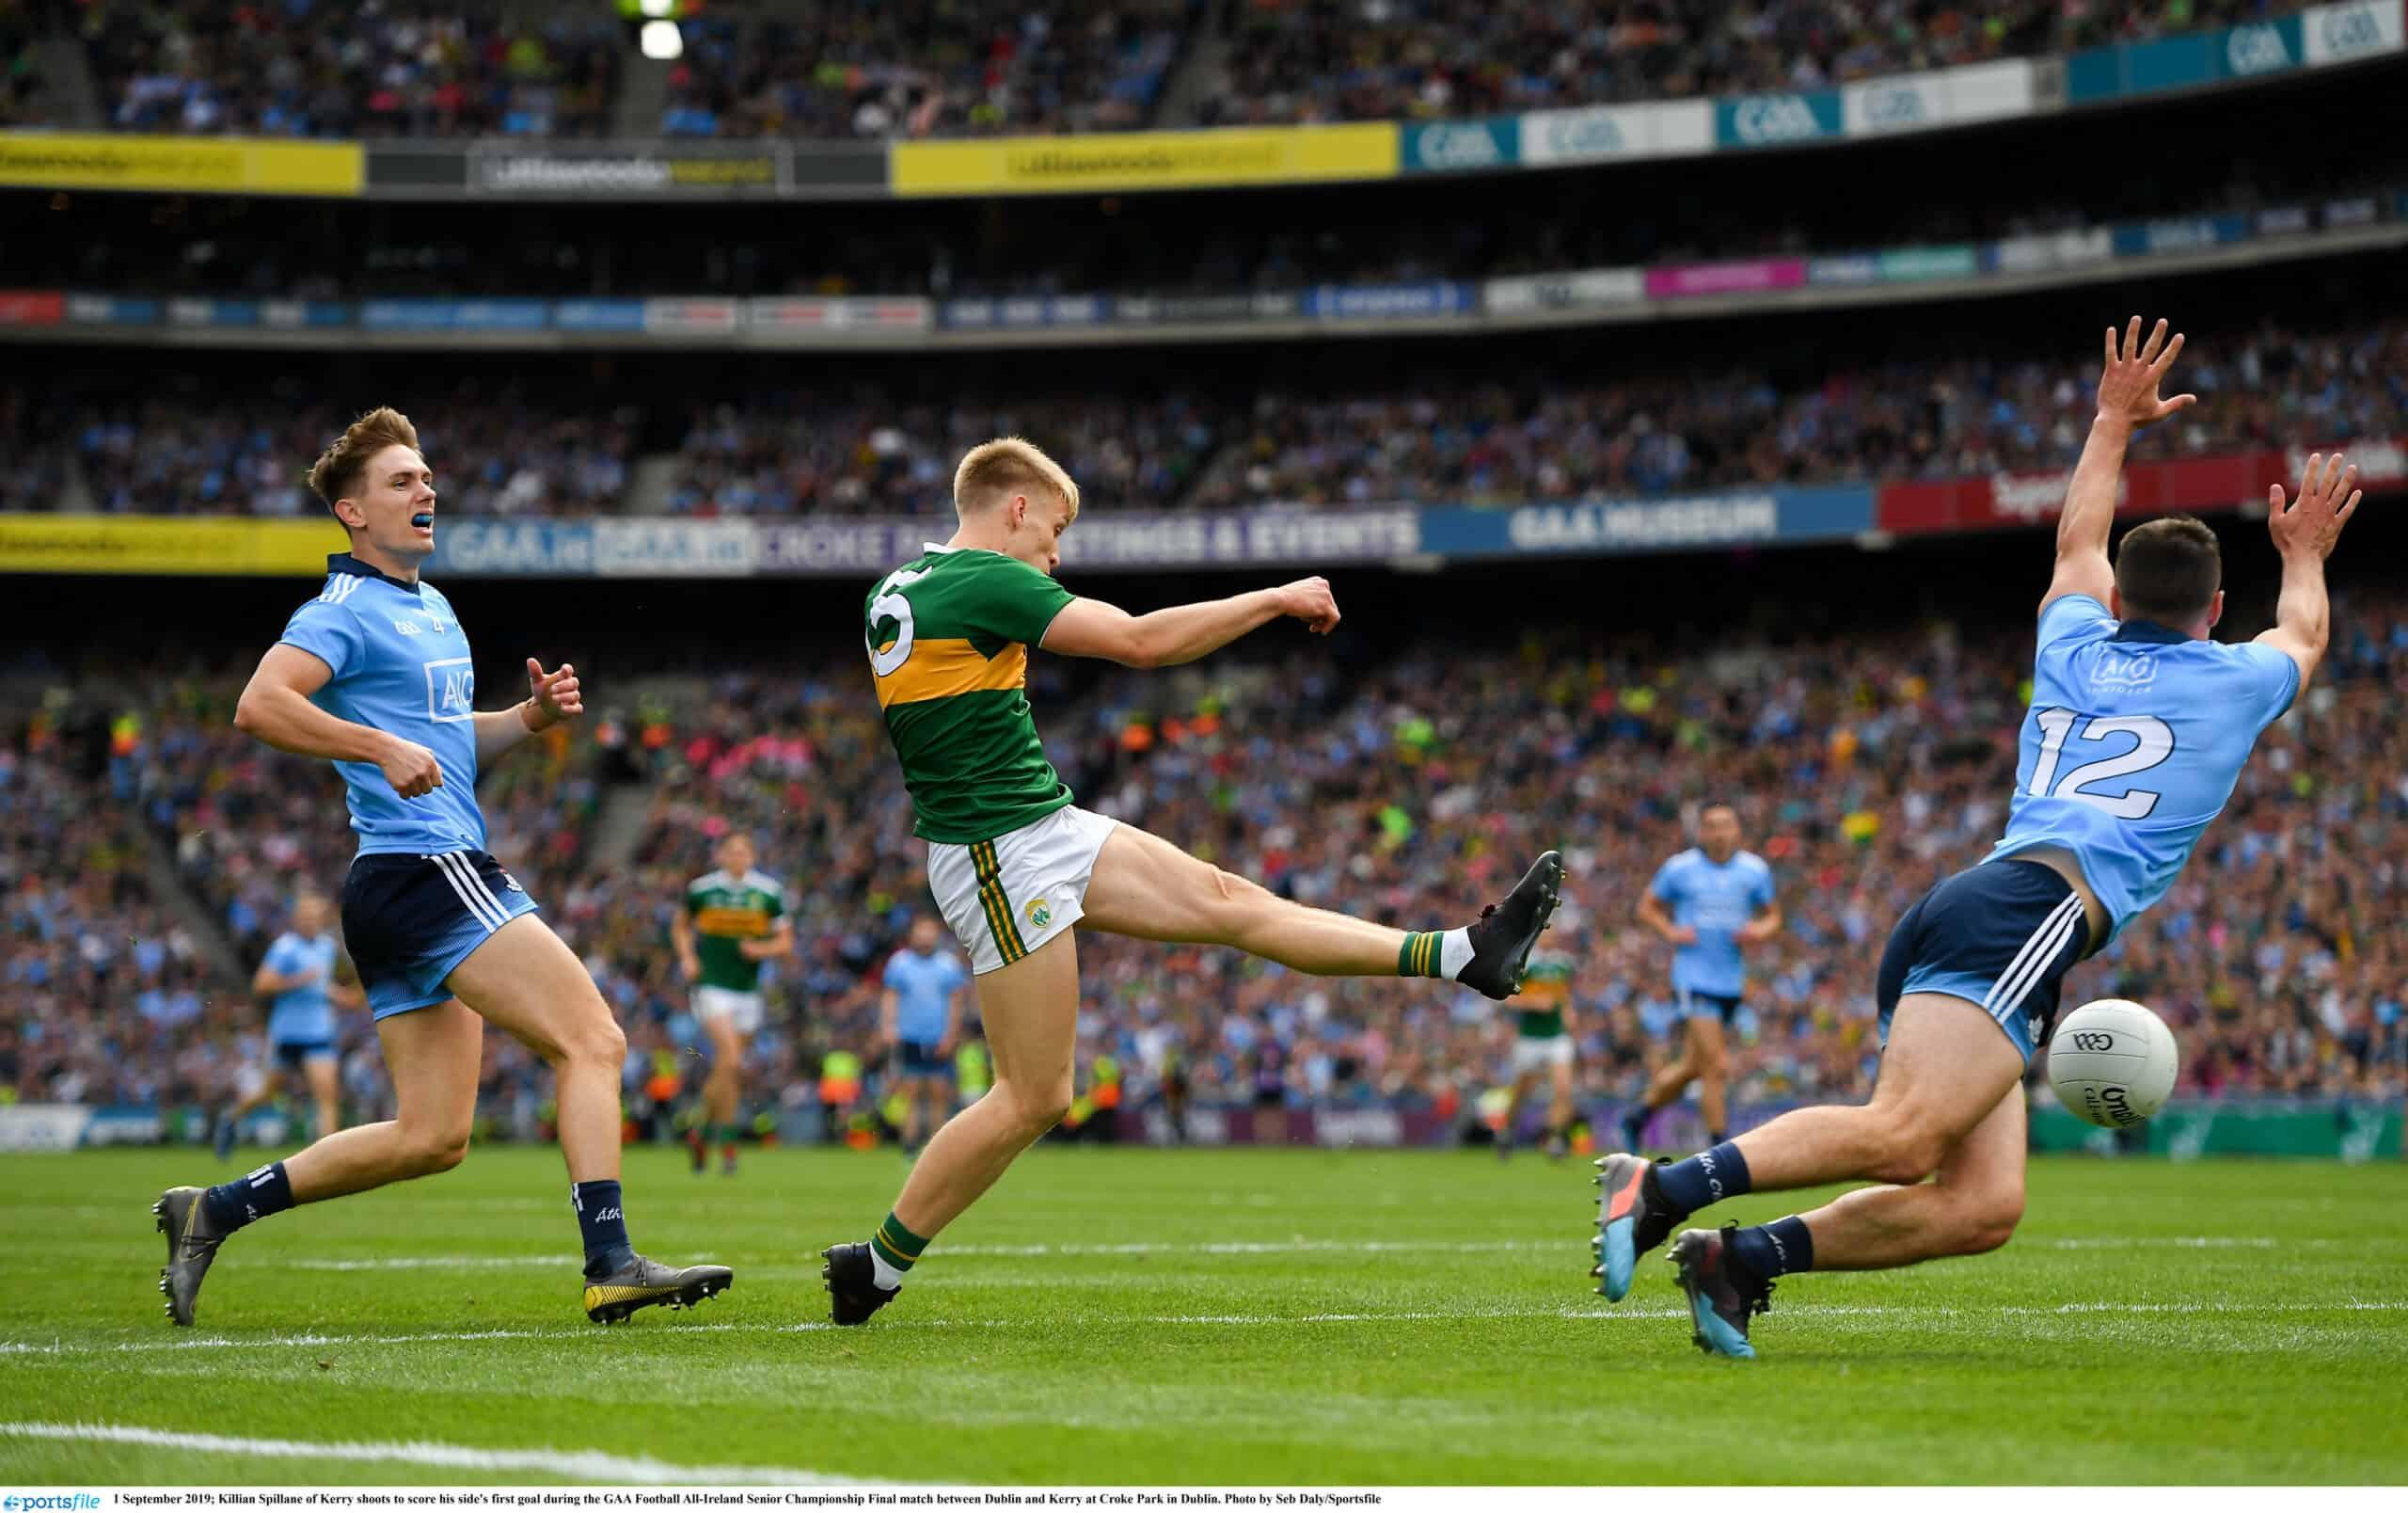 Kerry & Dublin have to go again!!